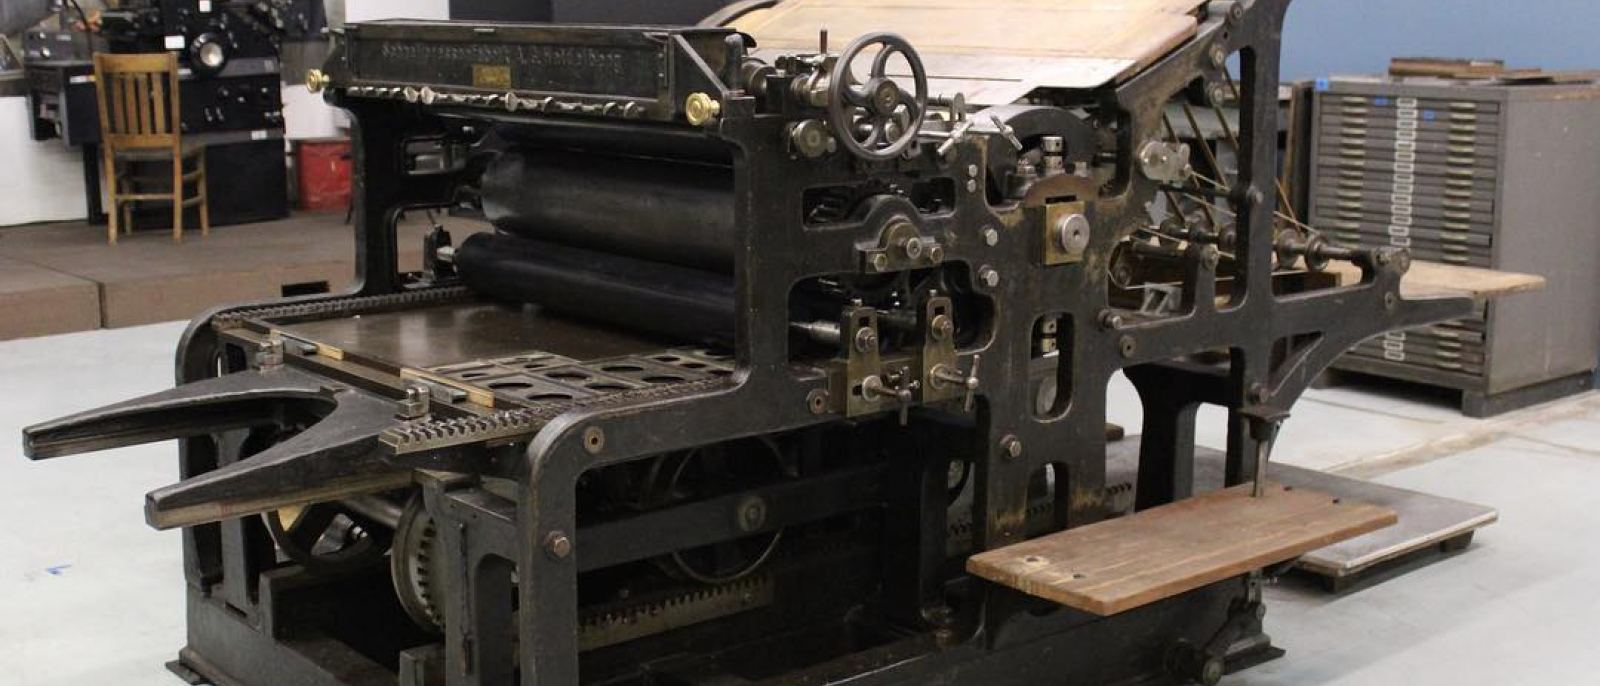 Heidelberg Press at the International Printing Museum